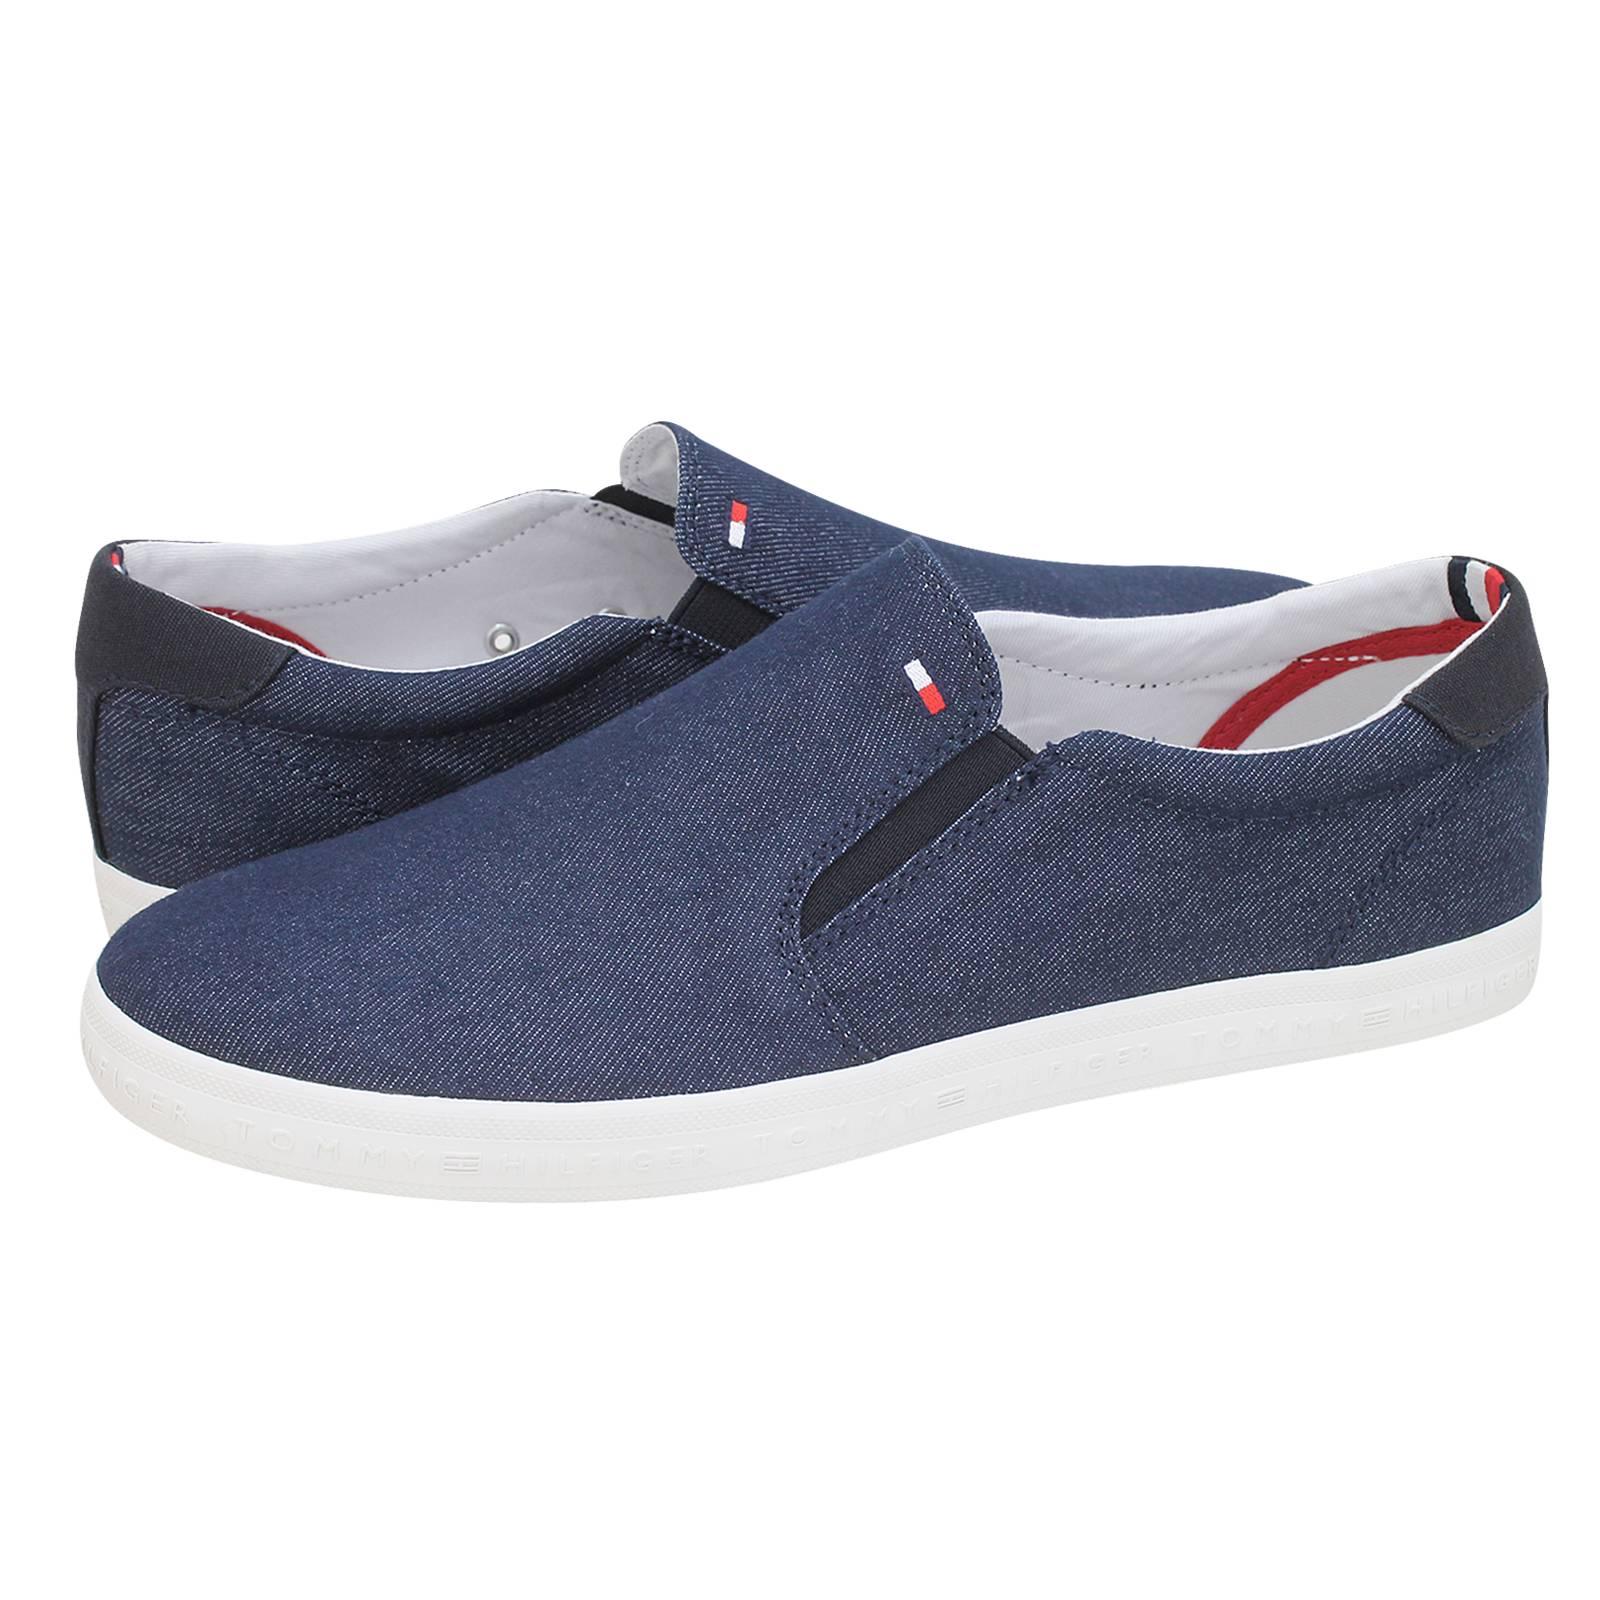 43f1f8b9a1c Παπούτσια casual Tommy Hilfiger Essential Slip On Sneaker